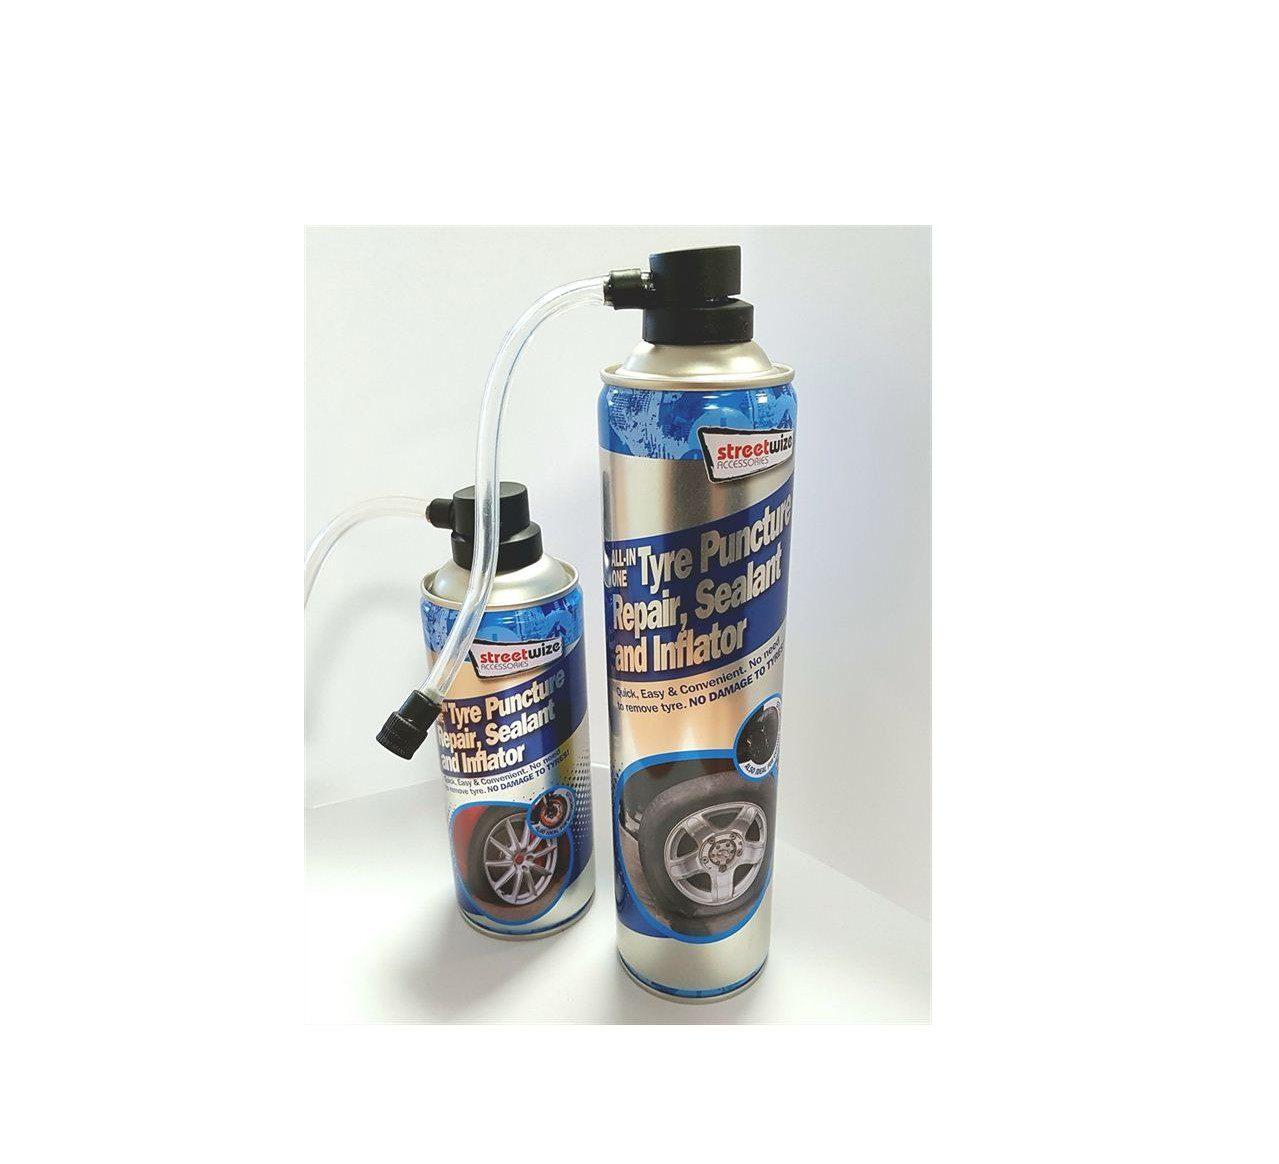 Streetwize Tyre puncture repair sealer/ inflator